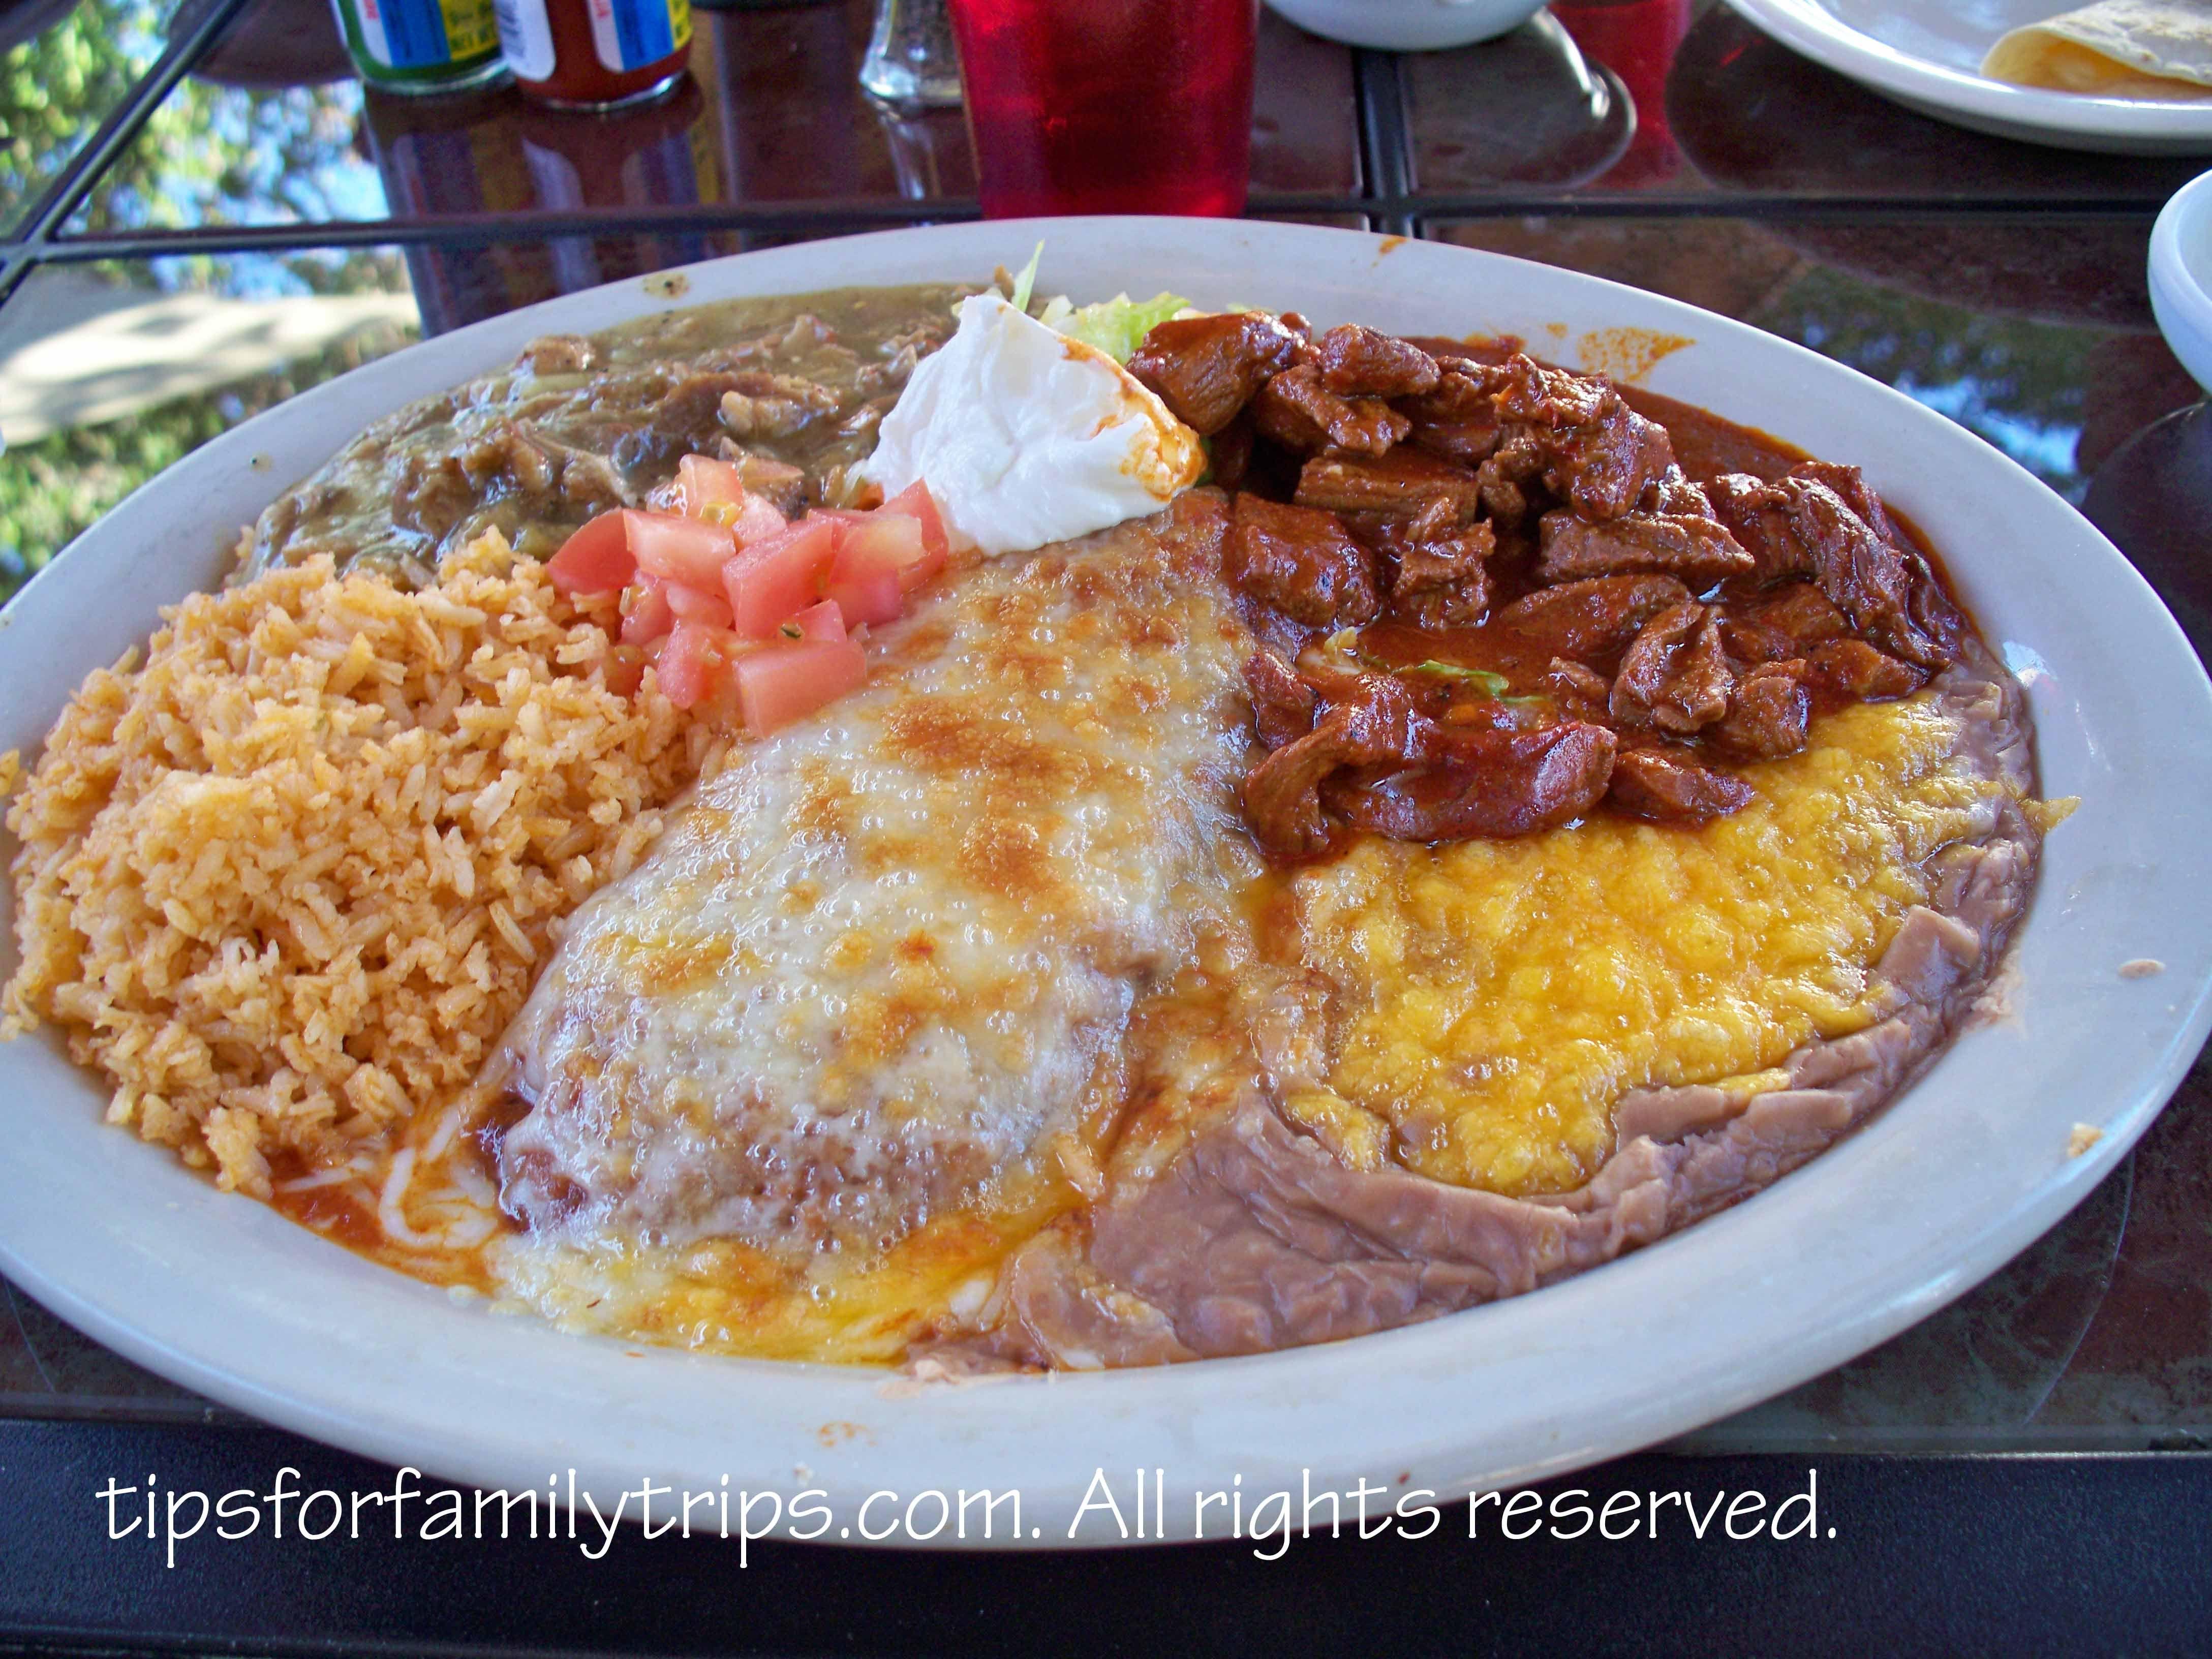 La Casa Don Miguel Is A Great Restaurant For Families